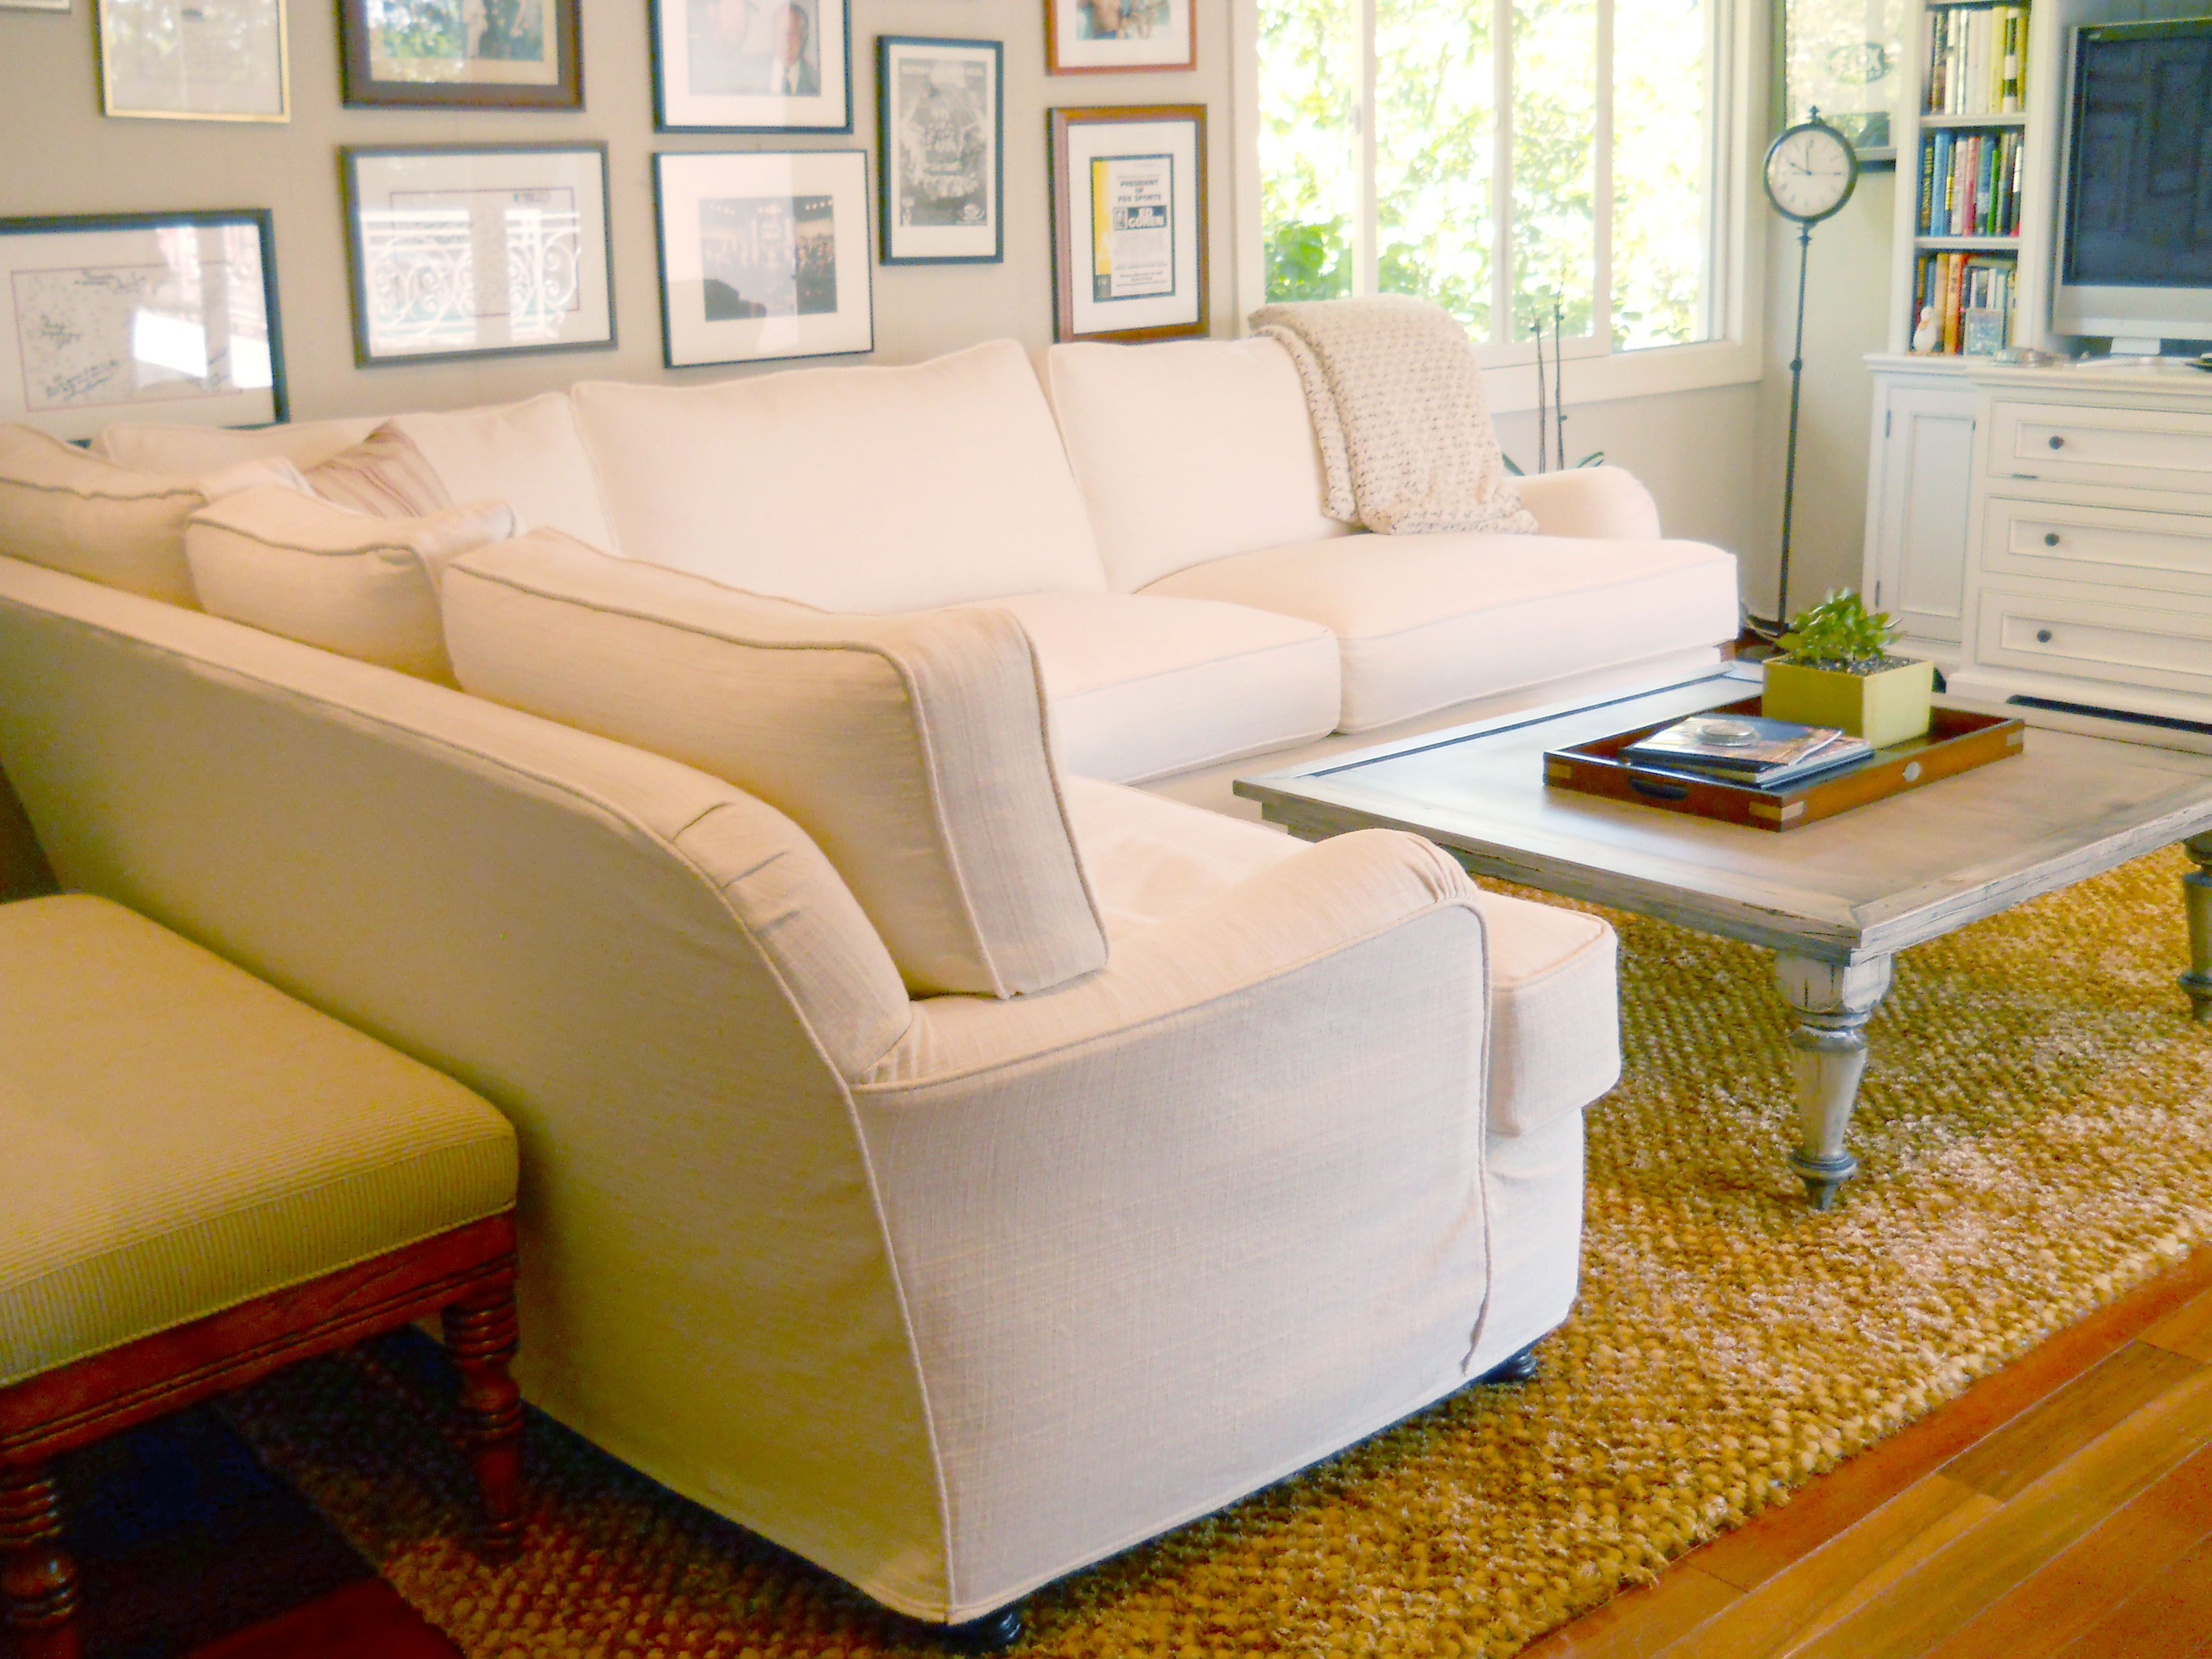 quatrine furniture. When You Create Luxury Furniture With Quatrine, Are Guaranteed A Beautiful Product And Promise Of Quality. Quatrine